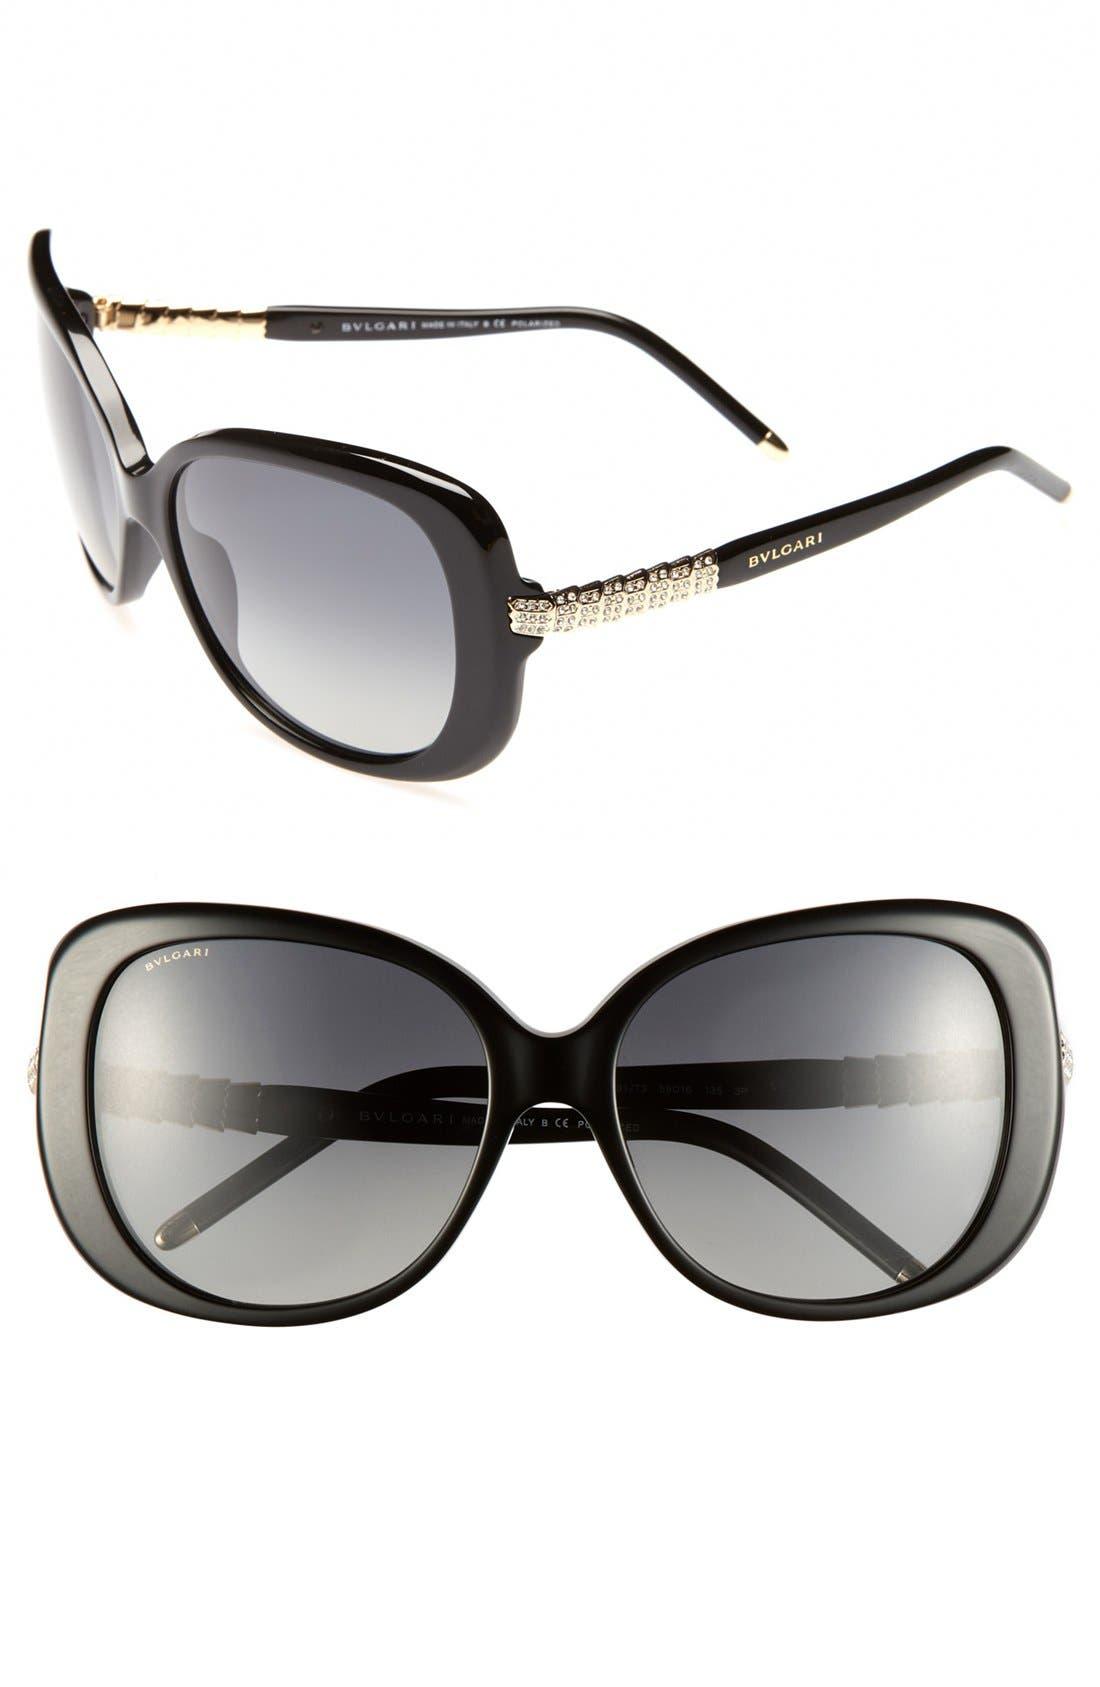 Alternate Image 1 Selected - BVLGARI 59mm Retro Sunglasses